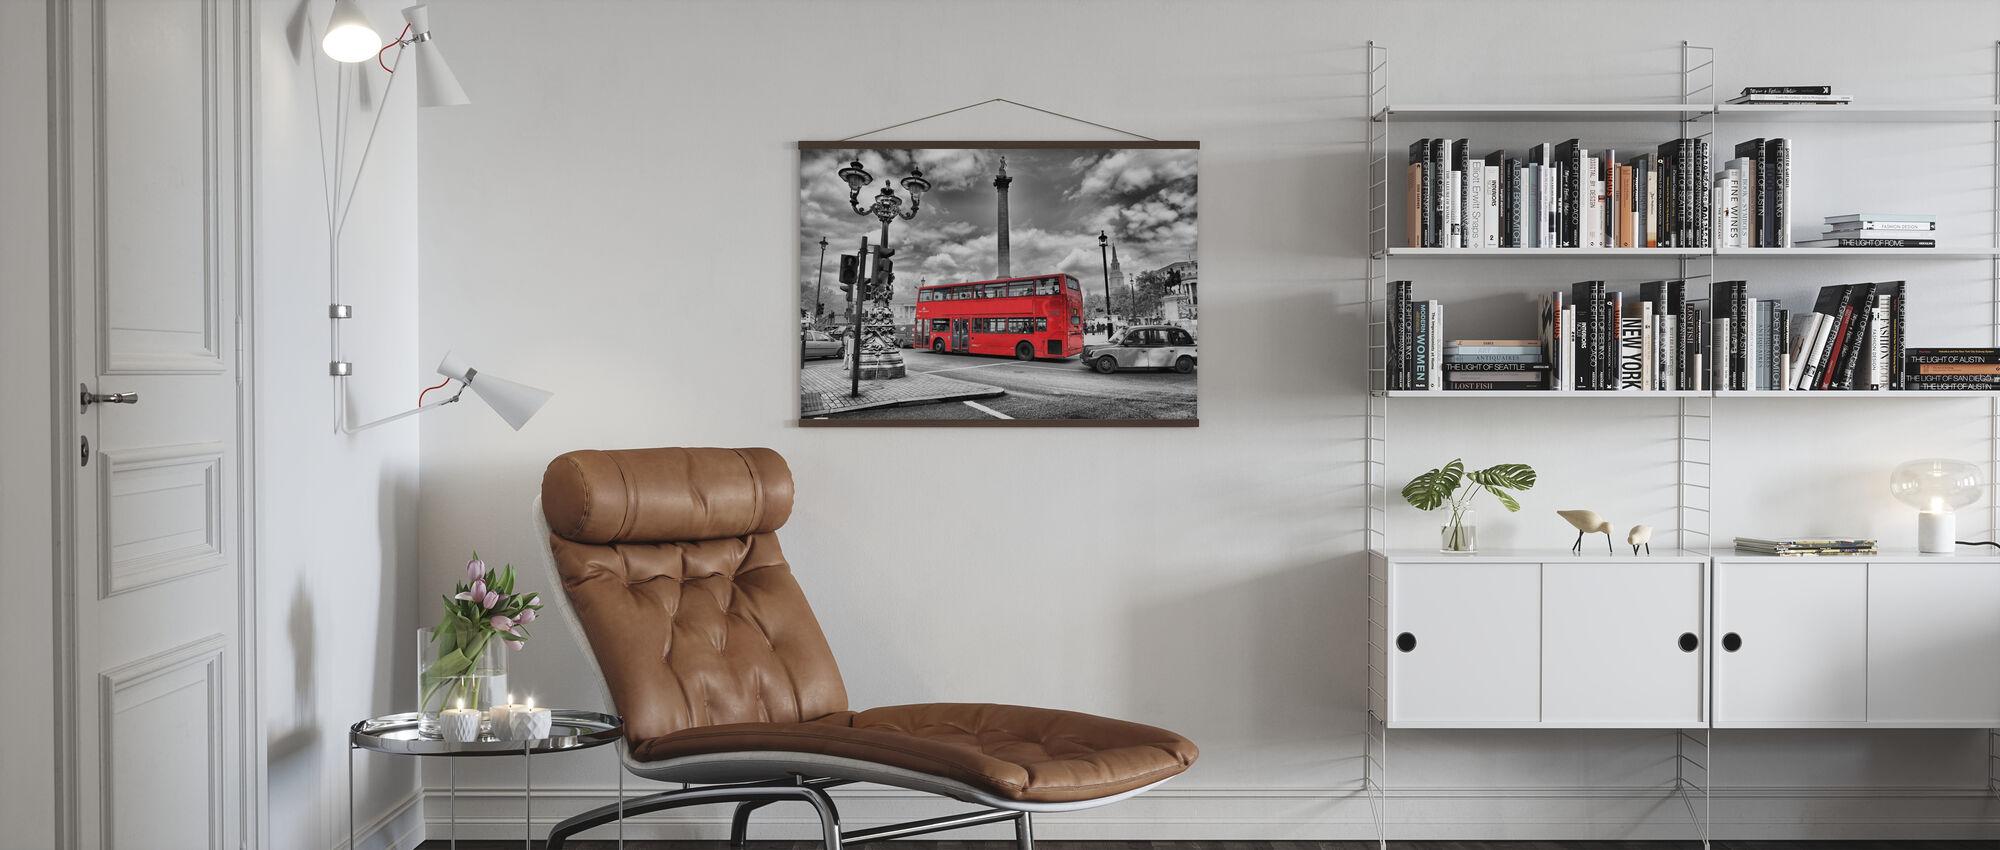 London Bus - Colorsplash - Poster - Living Room